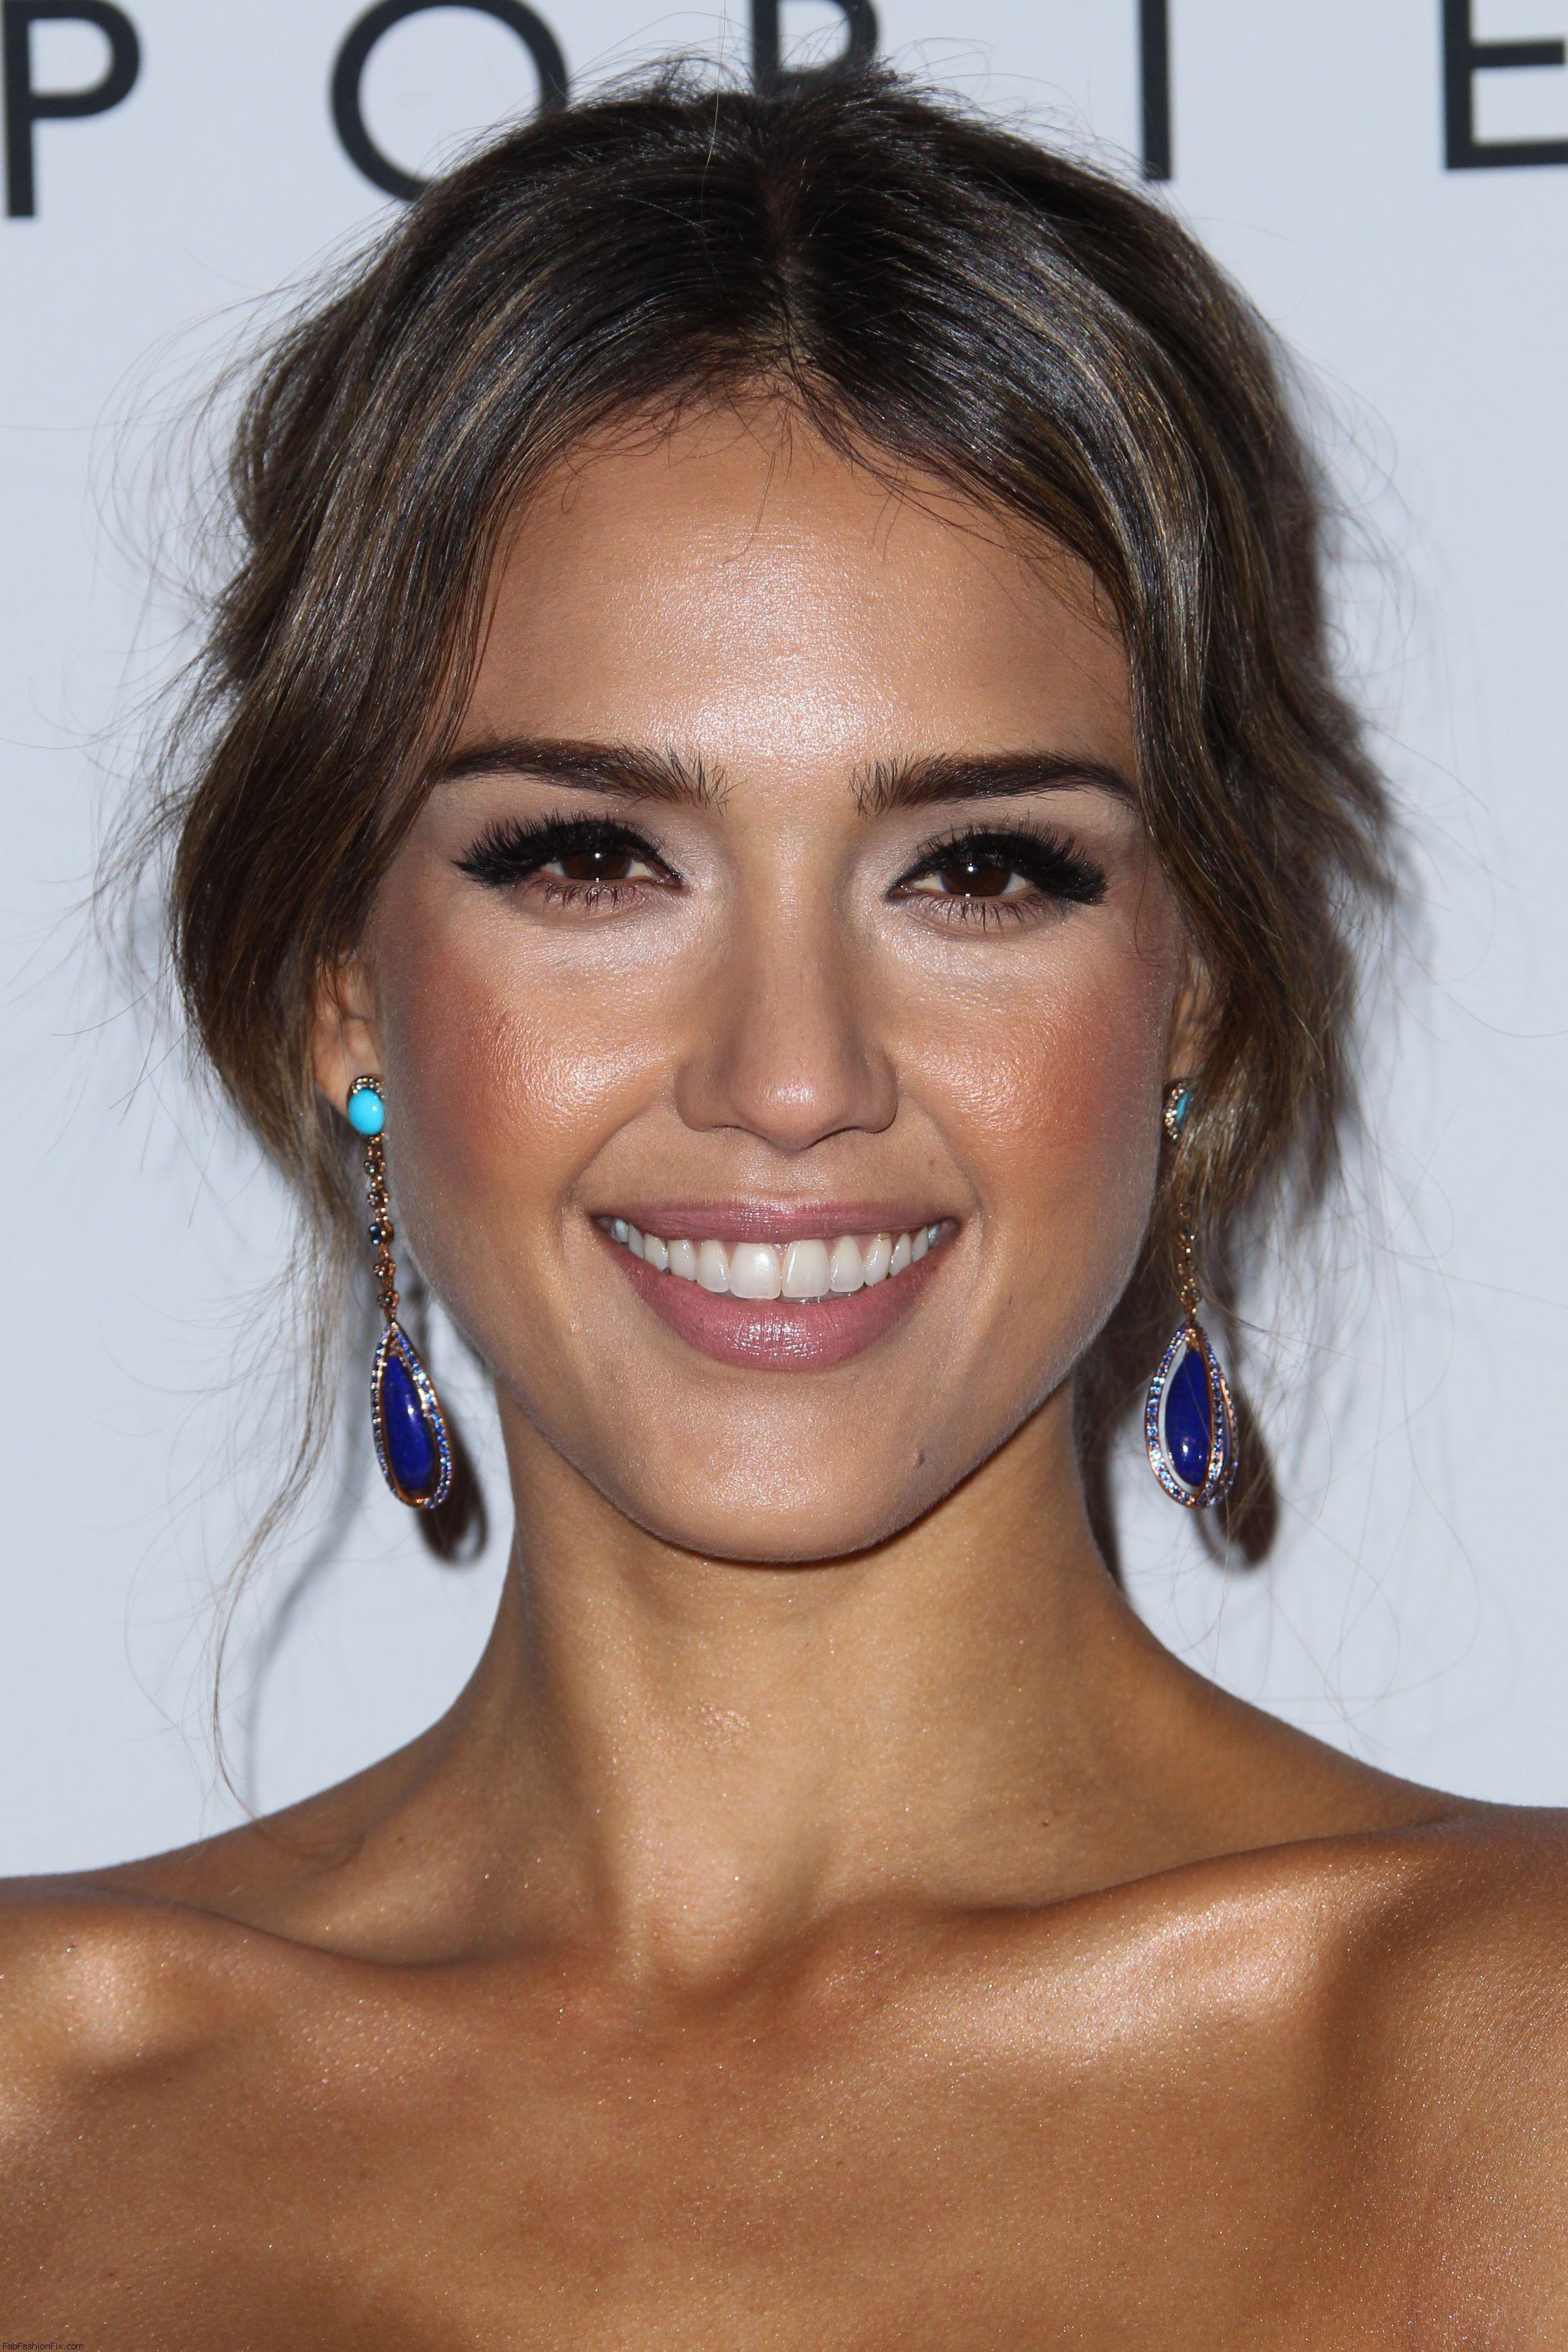 jessica alba gorgeous make-up | make-up | pinterest | jessica alba